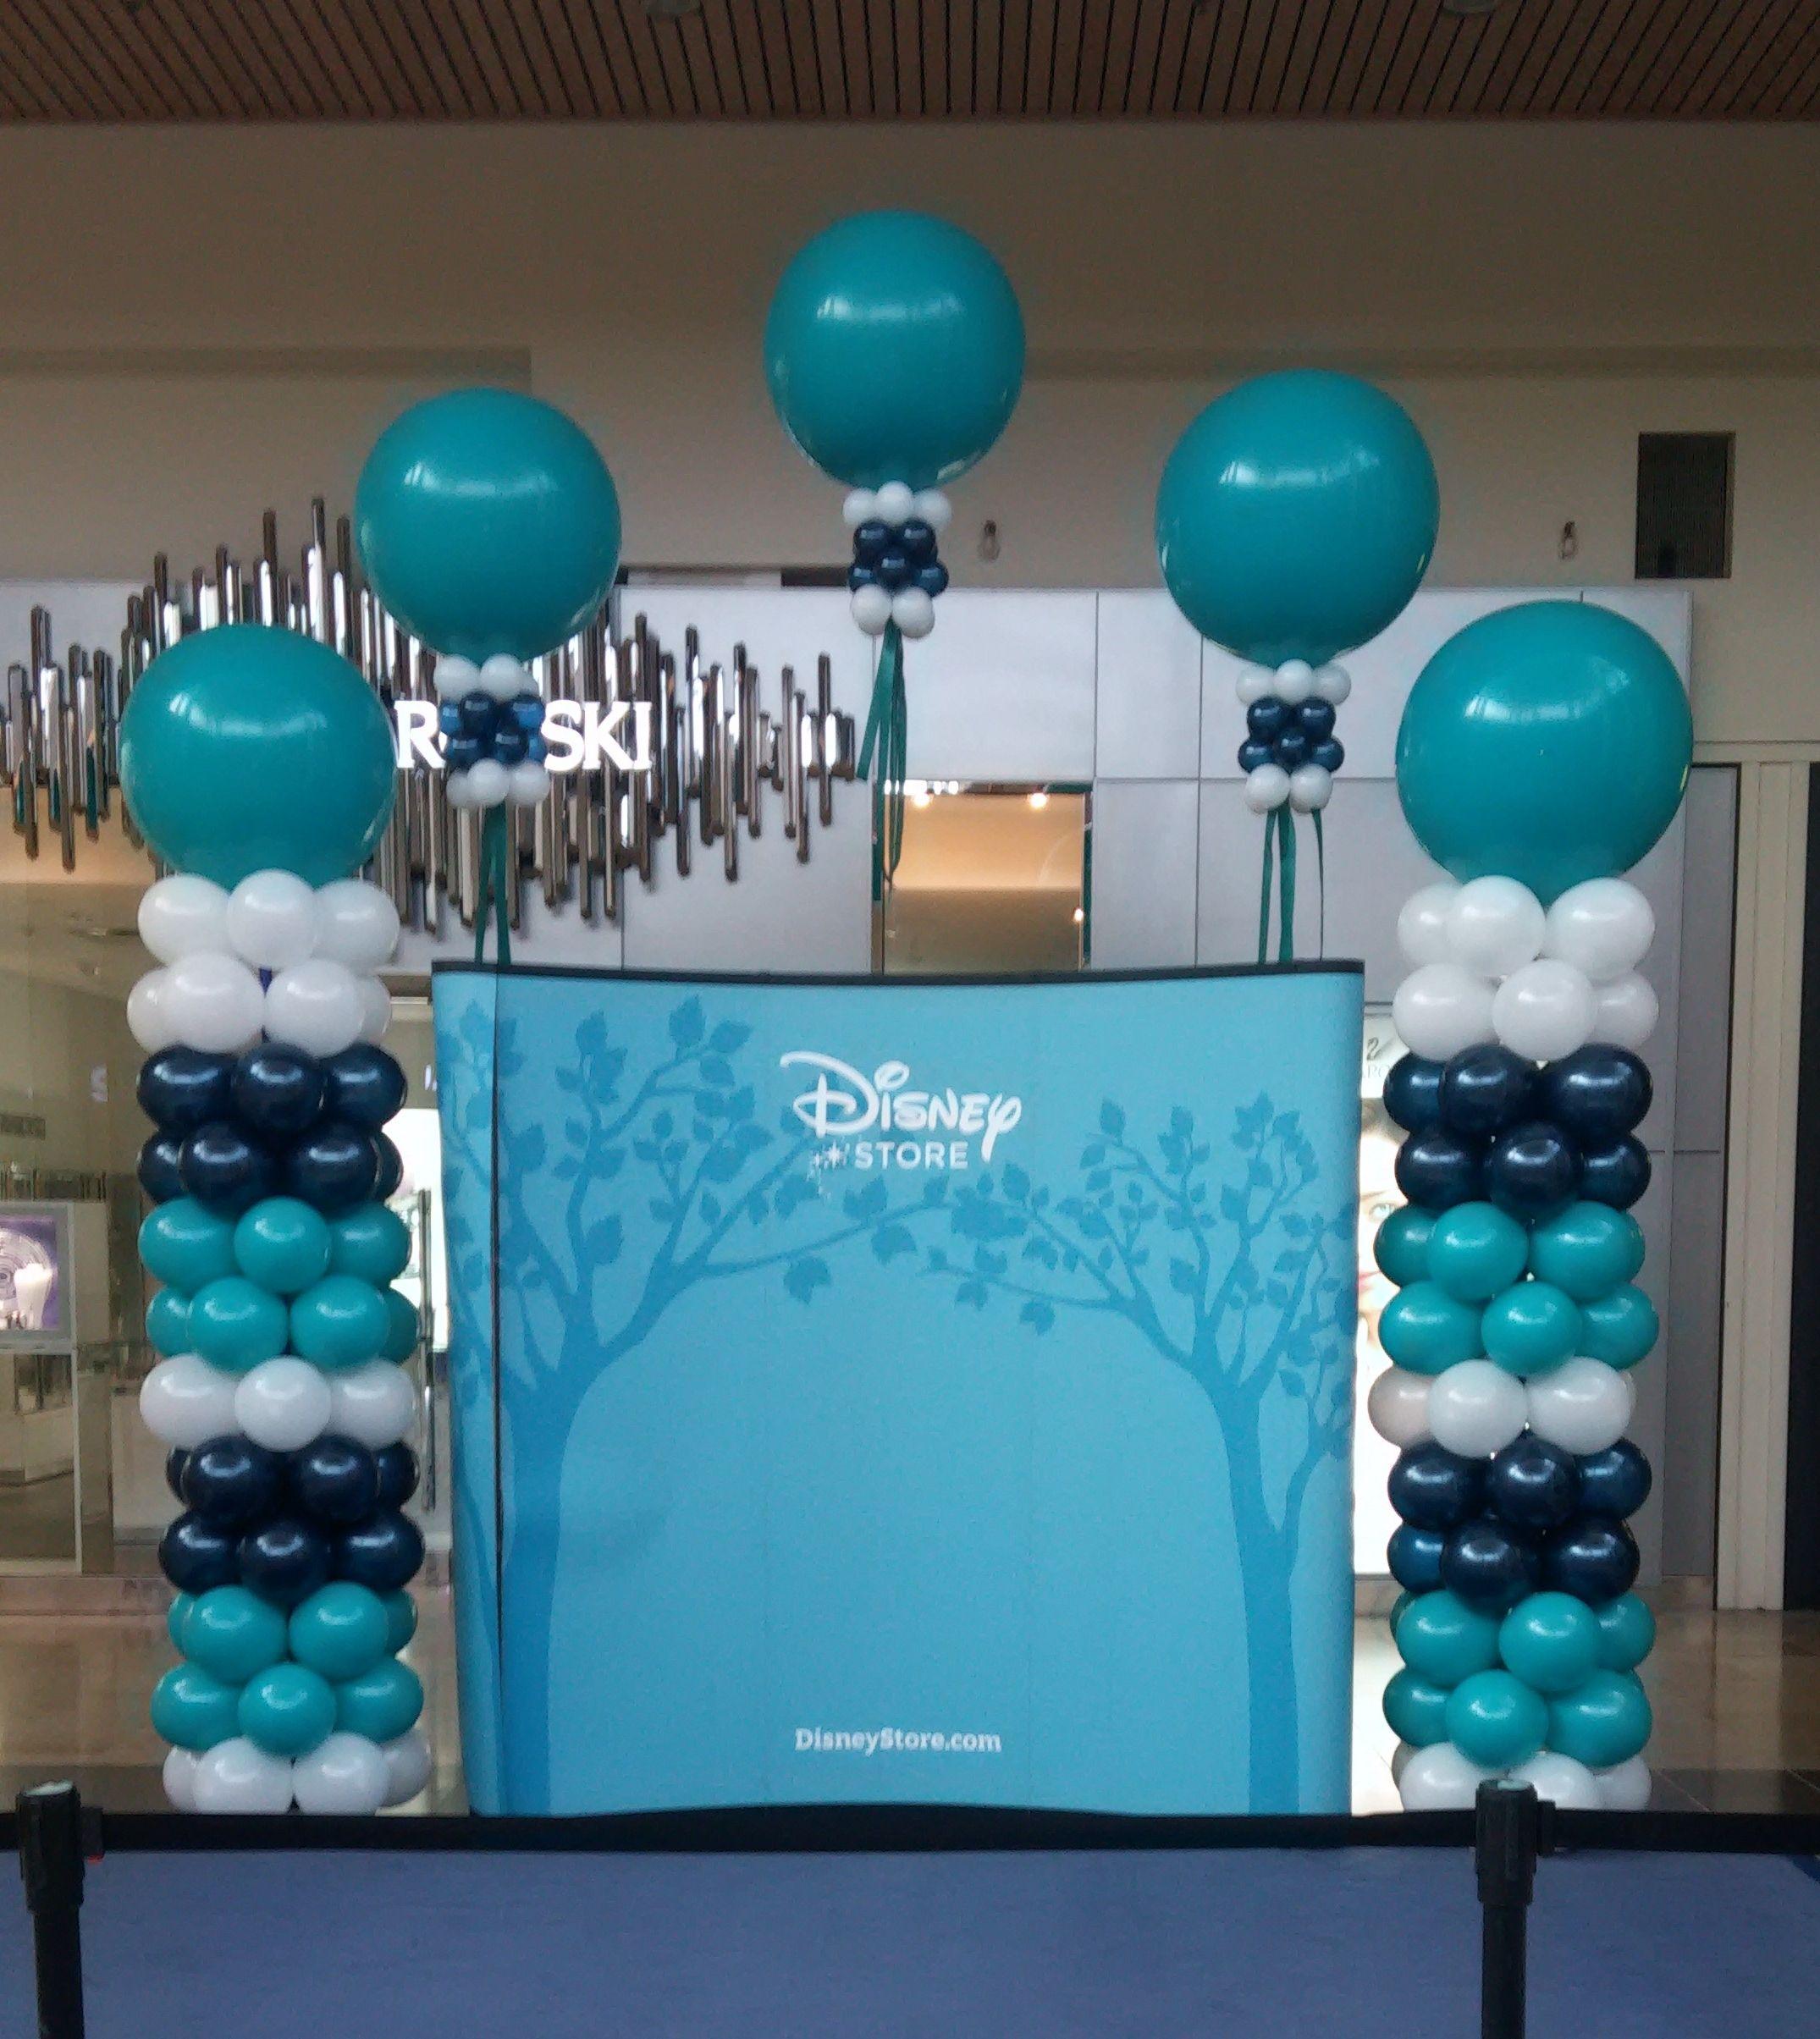 Grand opening ensemble with big balloons big balloons